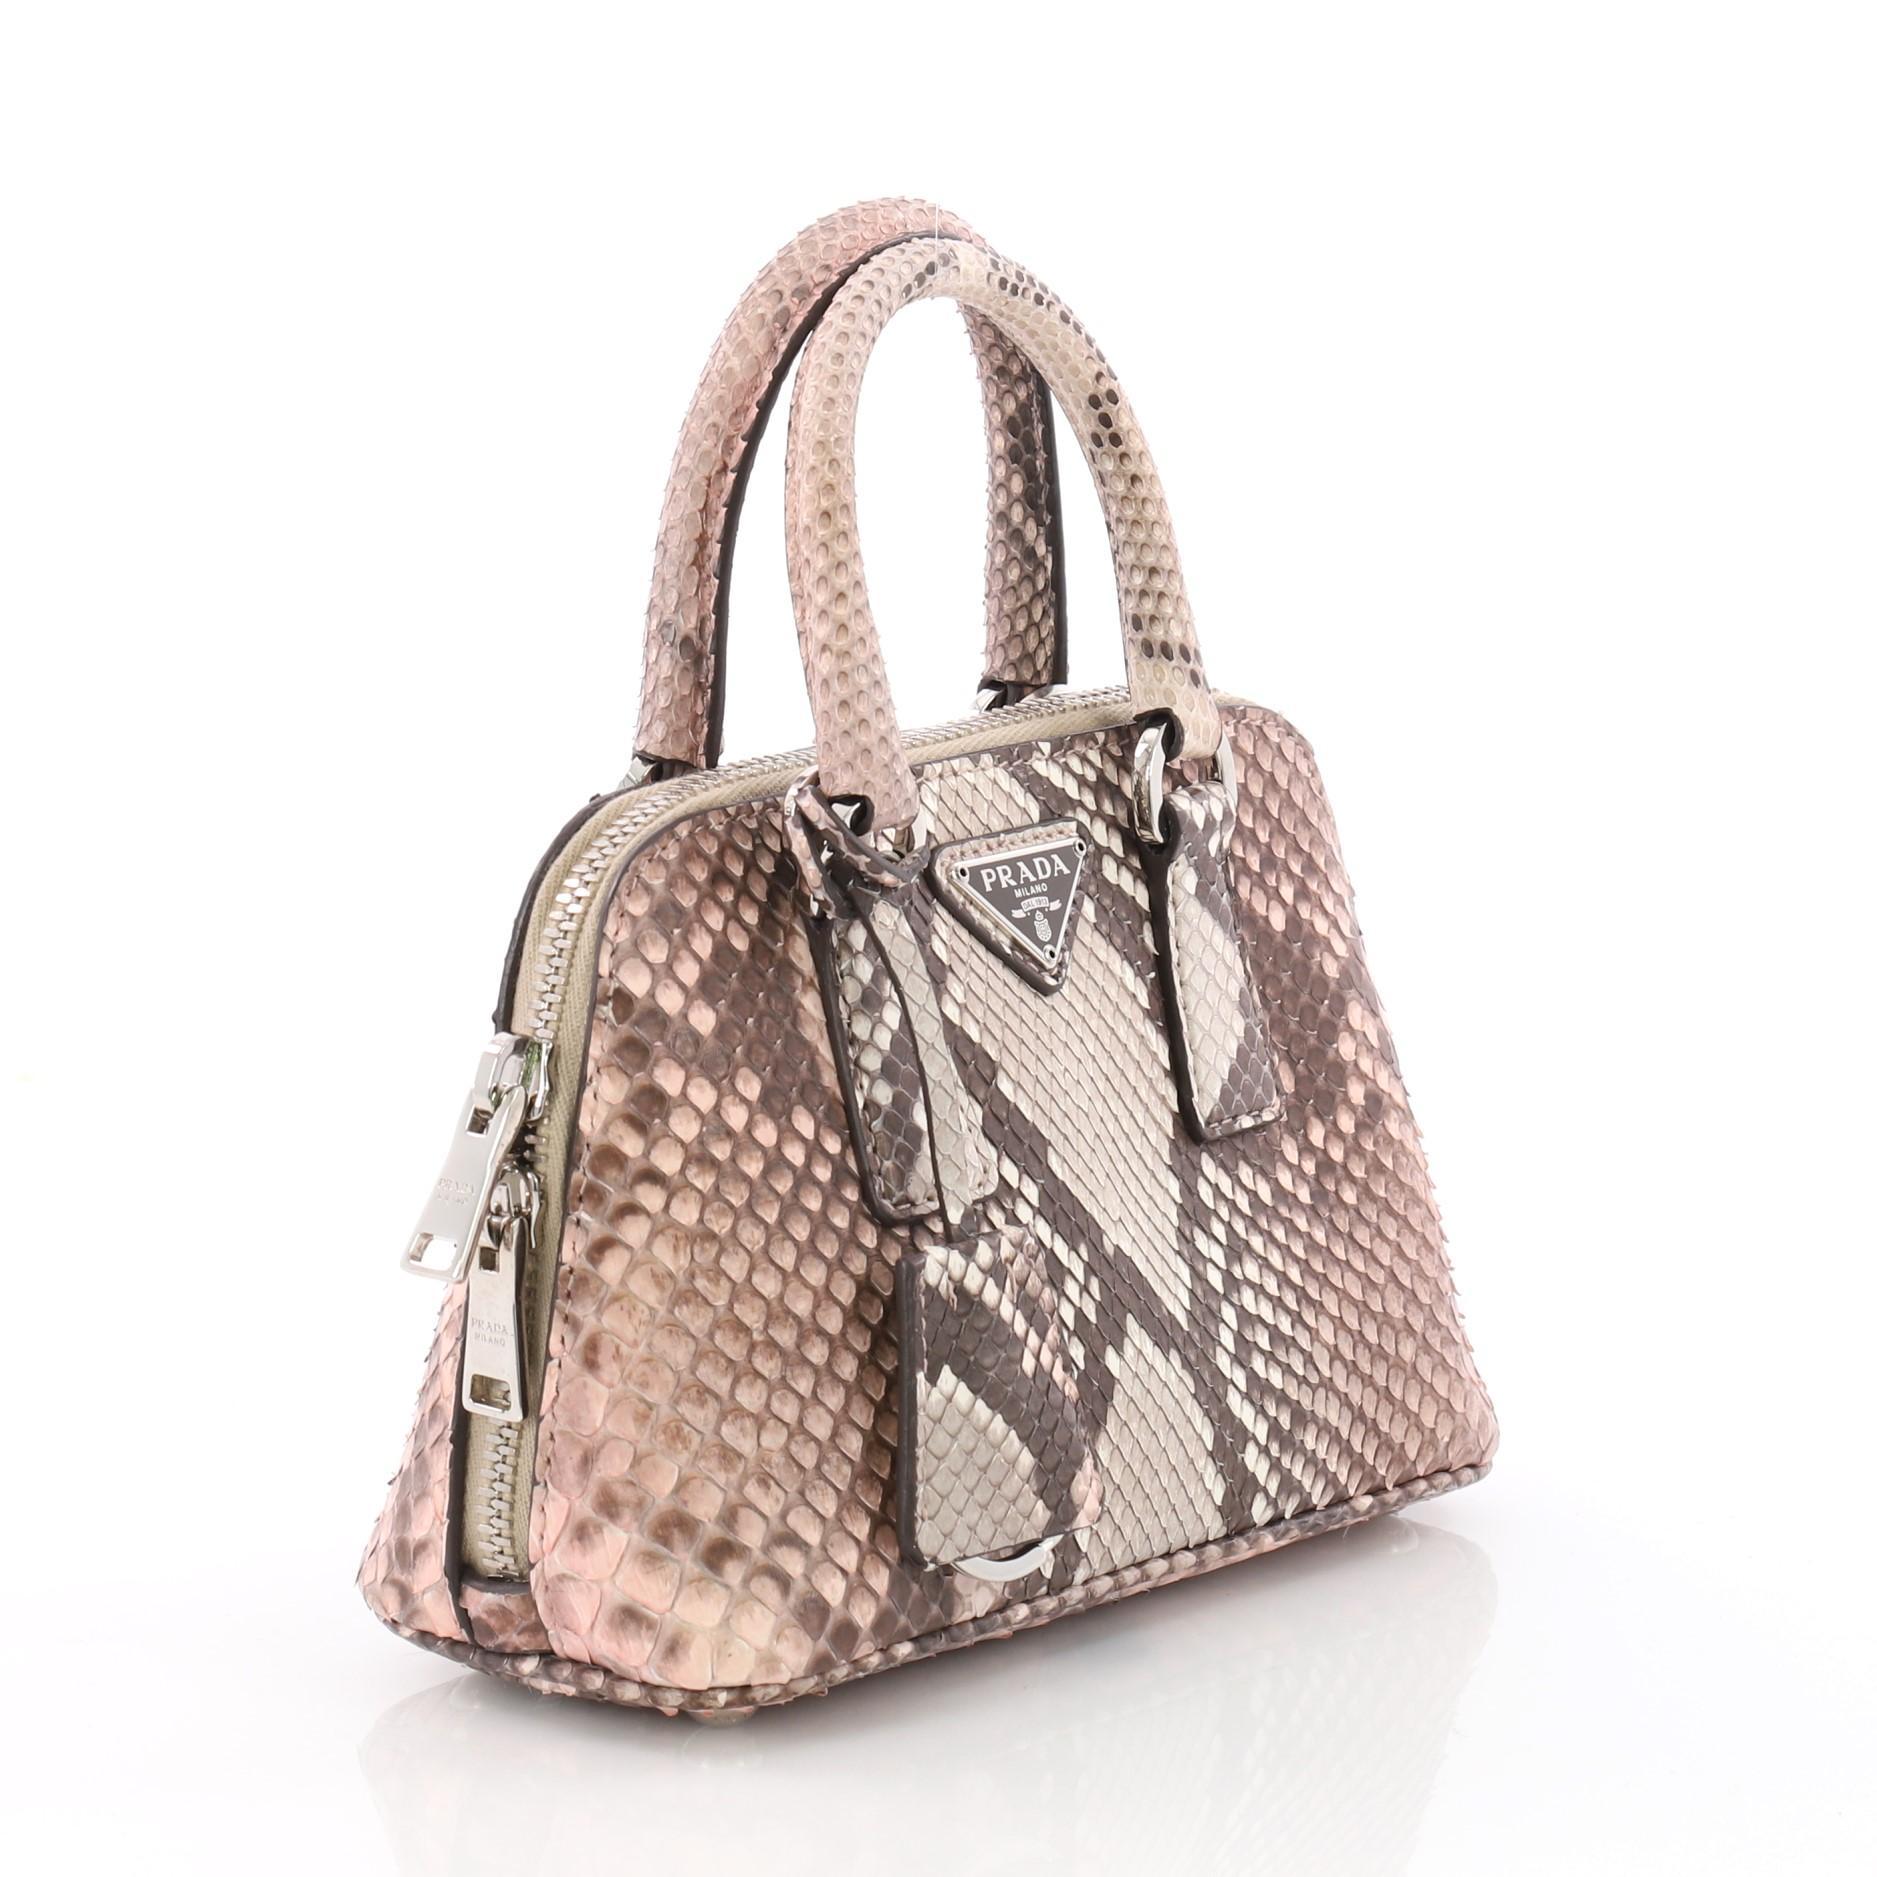 d599459ca4c5 Prada Promenade Handbag Python Mini at 1stdibs